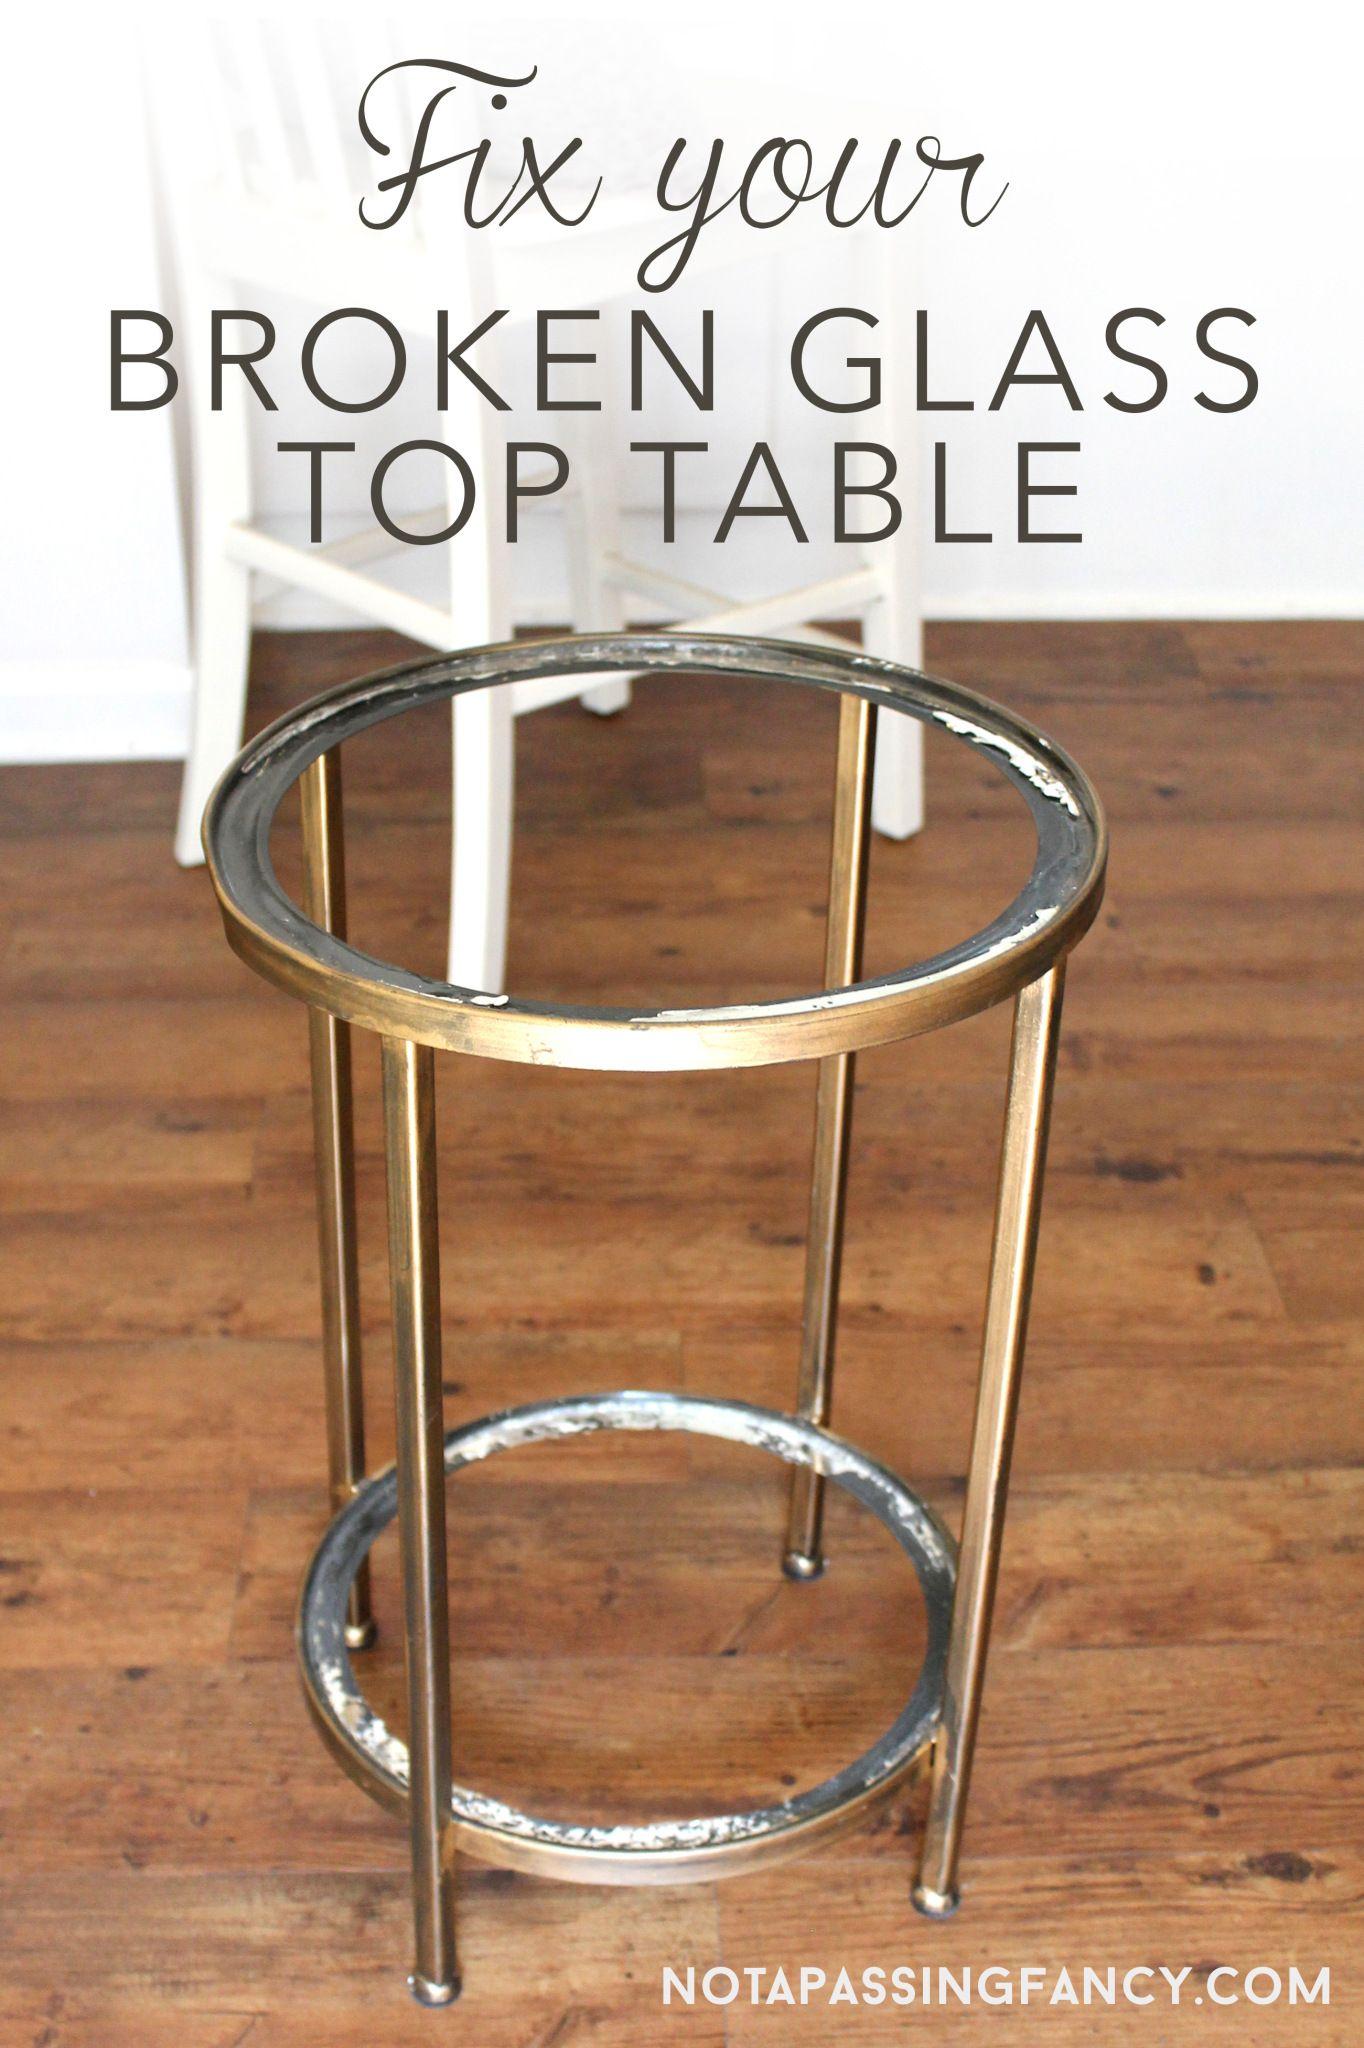 Broken glass top table not a passing fancy glass top